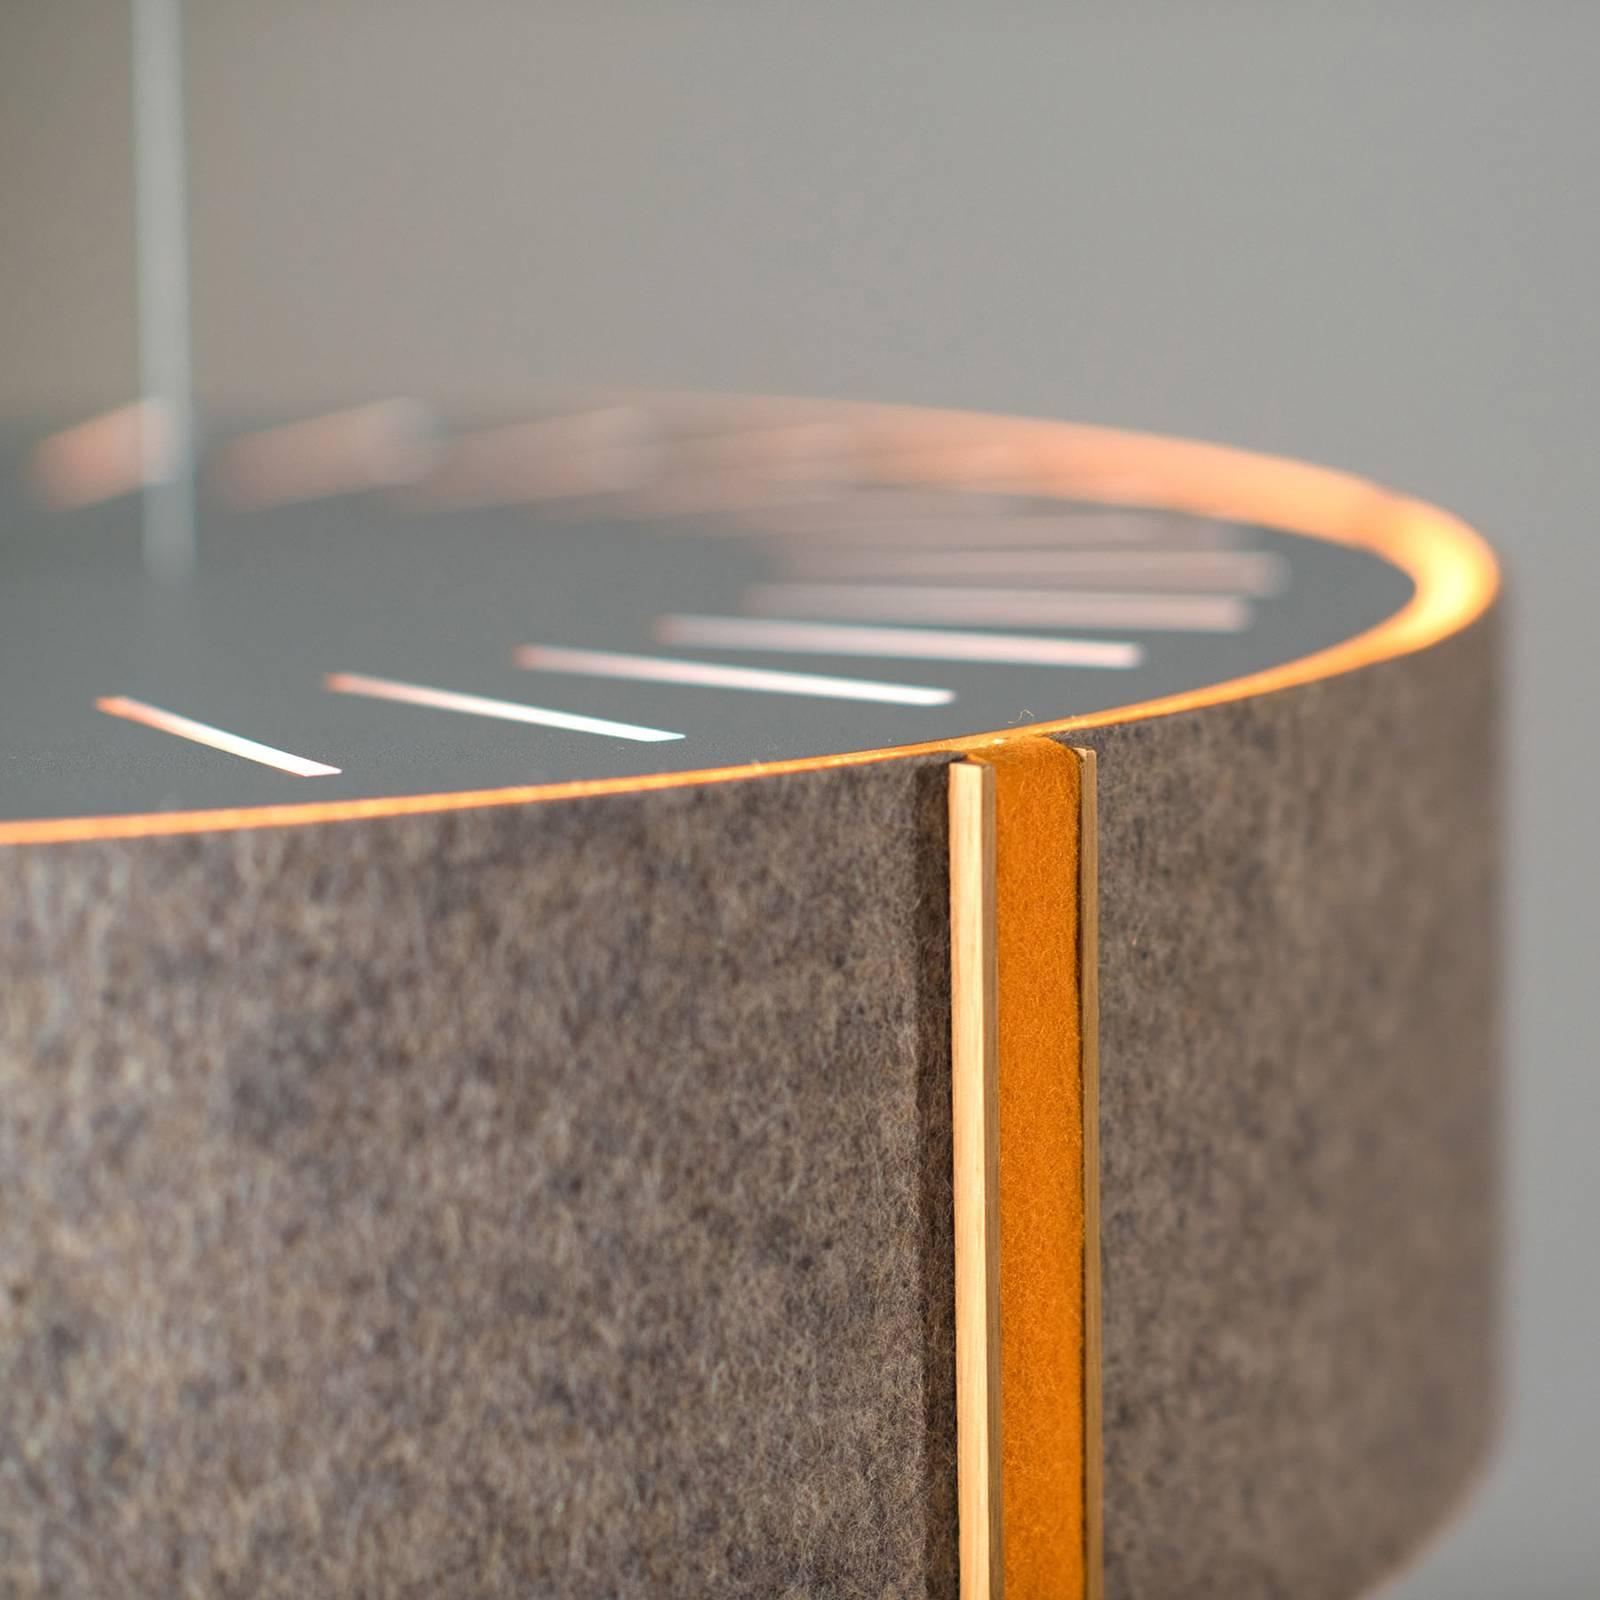 LED-riippuvalaisin LARAfelt M Ø43cm harmaa/oranssi